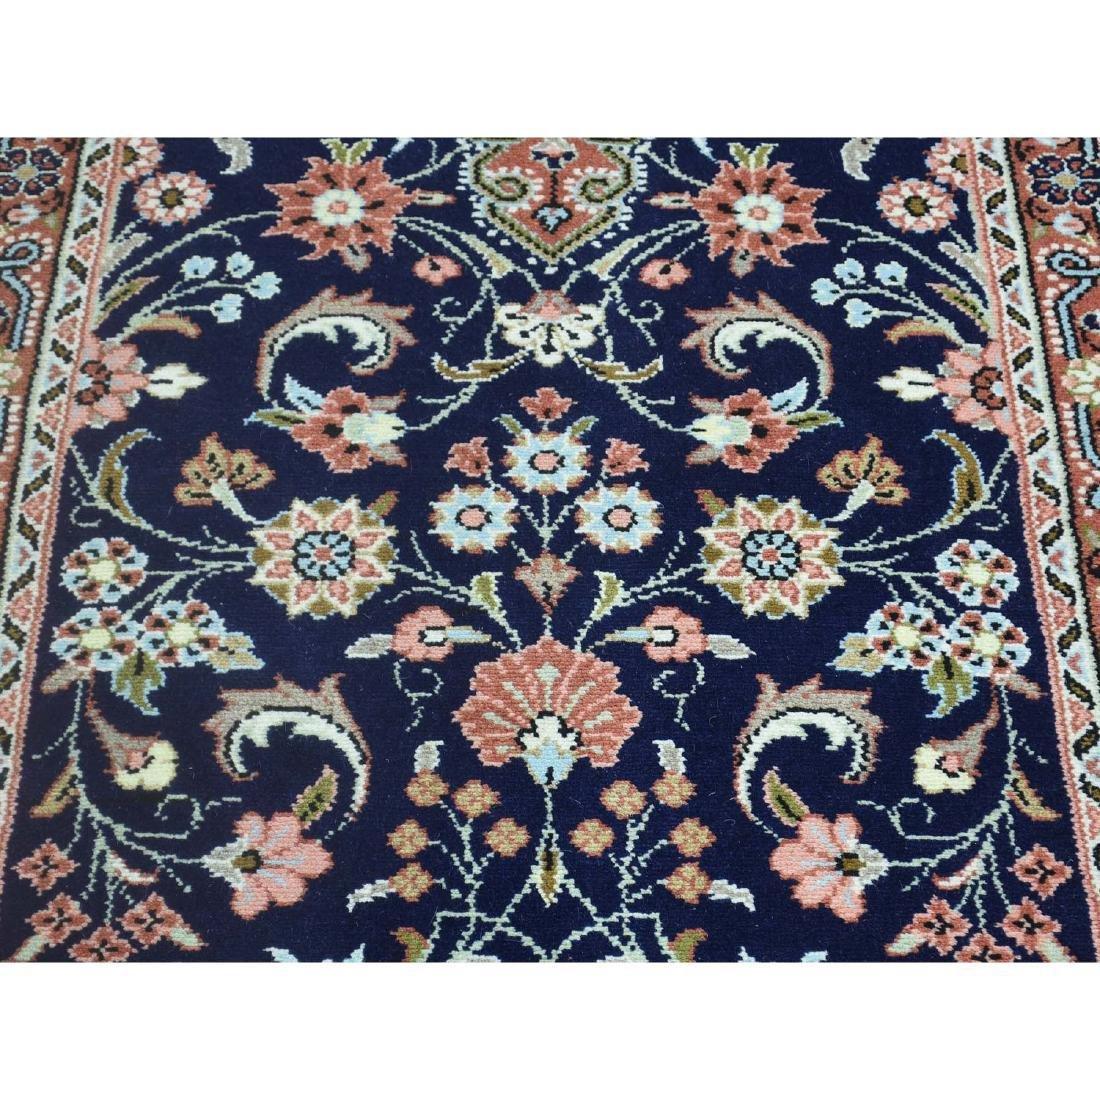 Handmade Persian Hamadan Runner Oriental Rug 2.8x10.2 - 9